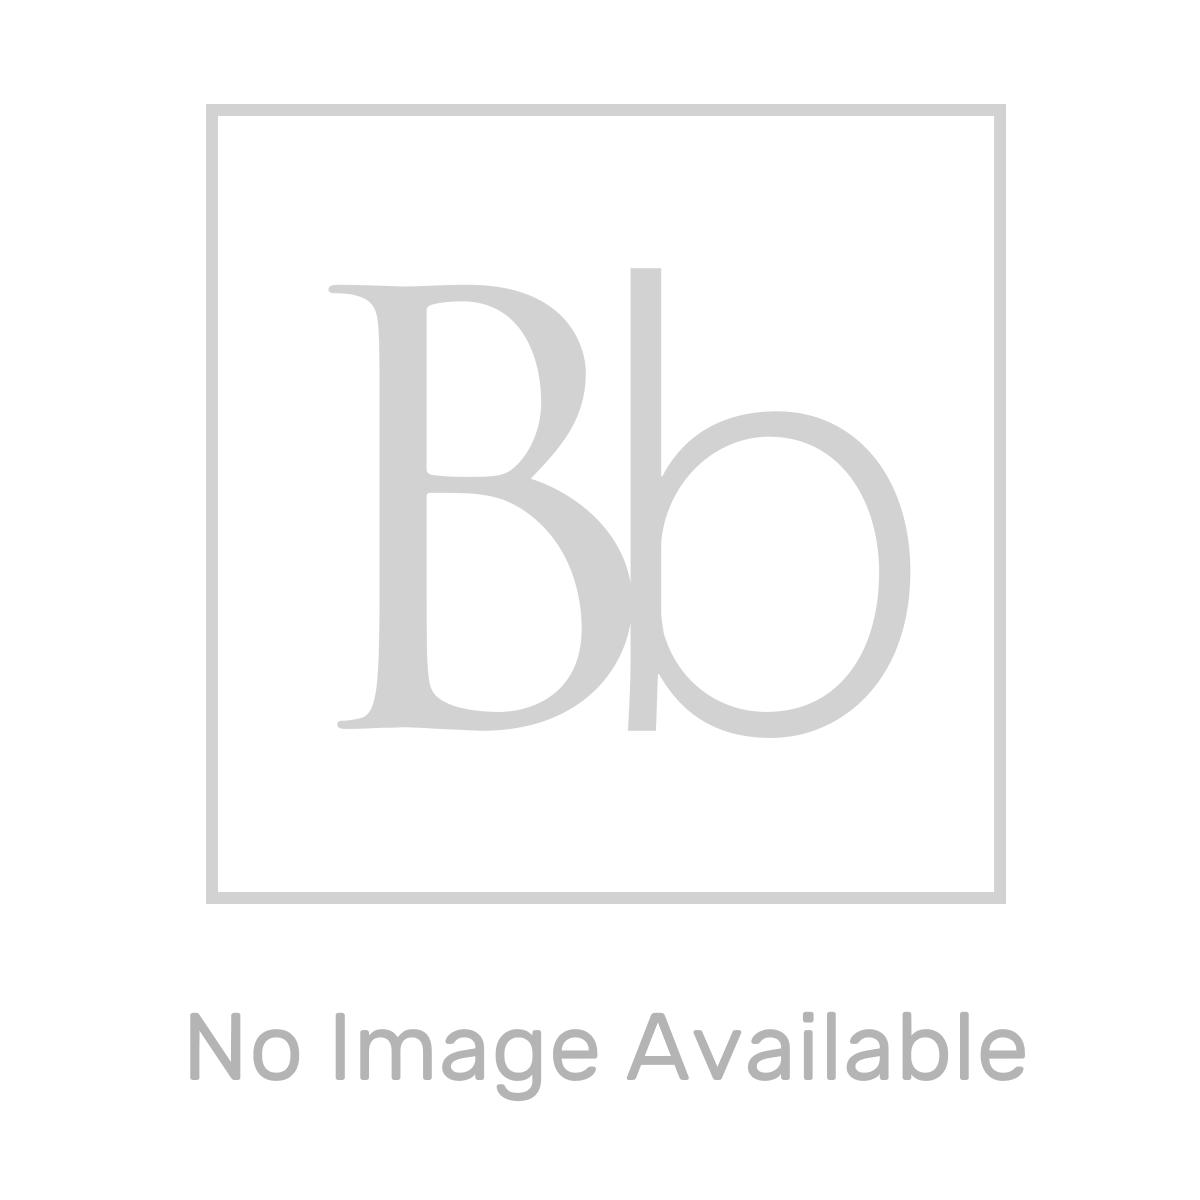 Premier Pearlstone Shower Tray Riser Kit 1200 x 900mm Offset Quadrant Legs